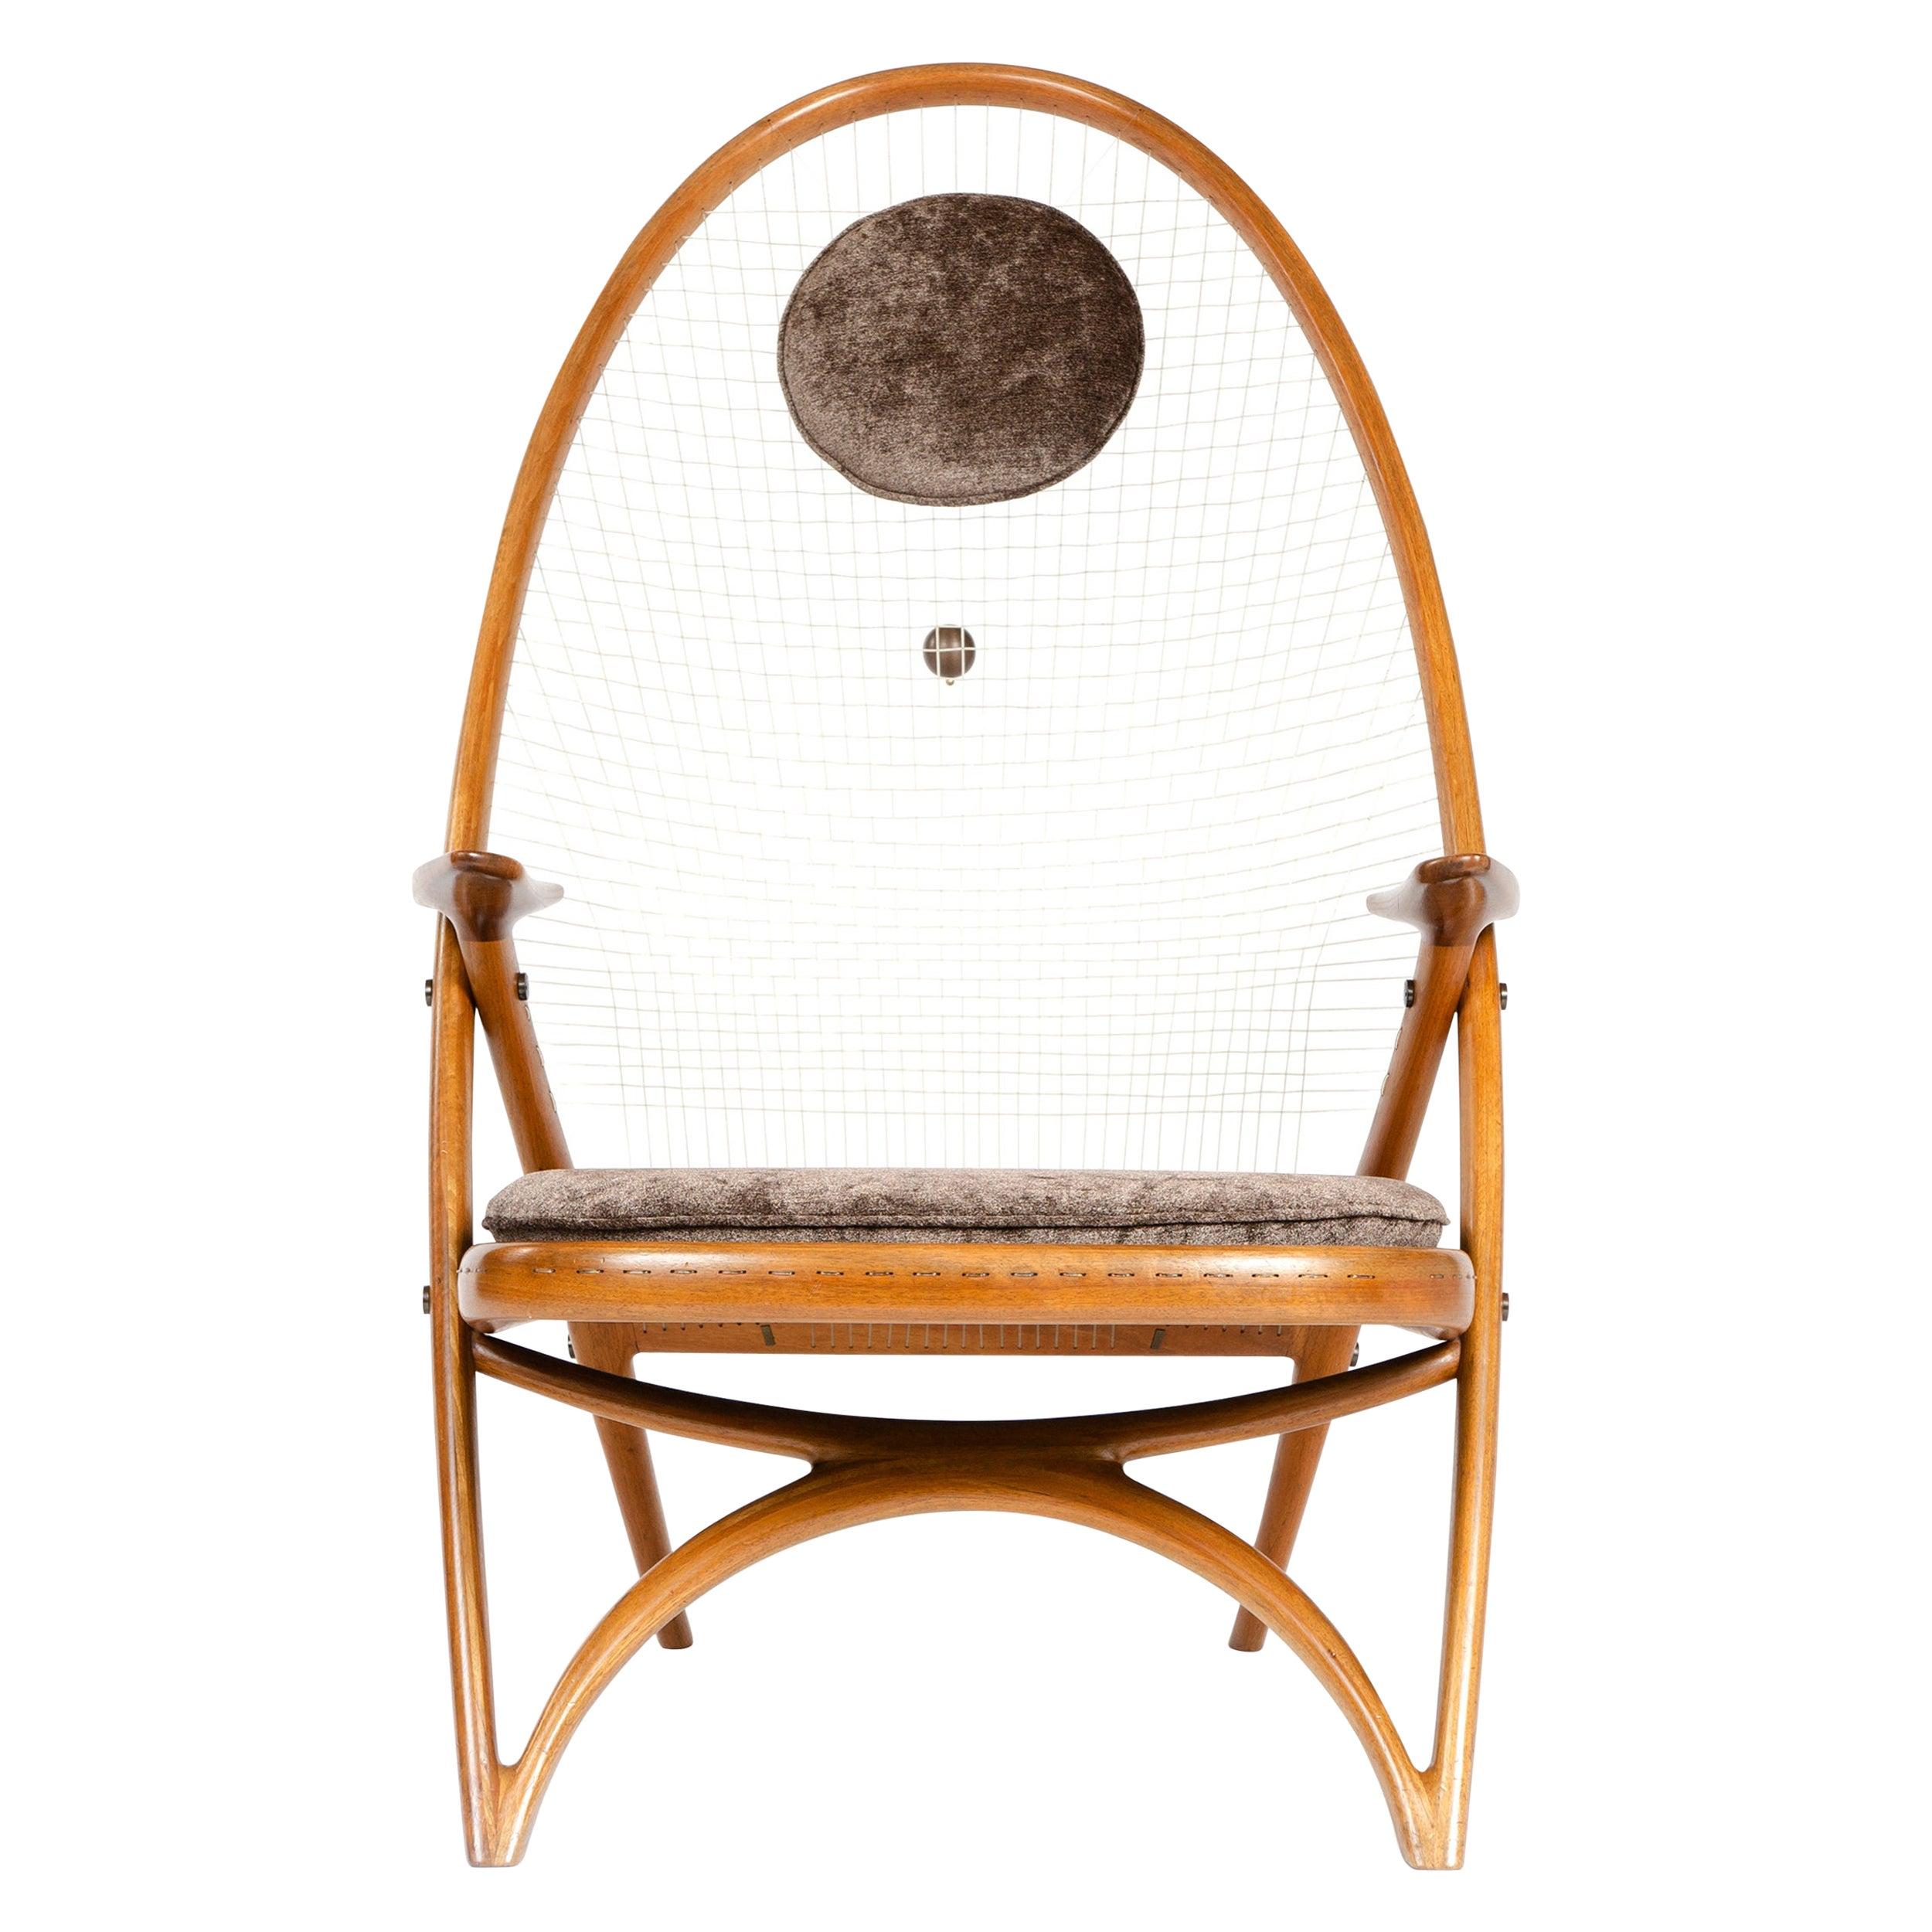 1950s Racquet Chair by Vestergaard Jensen for Peder Pedersen